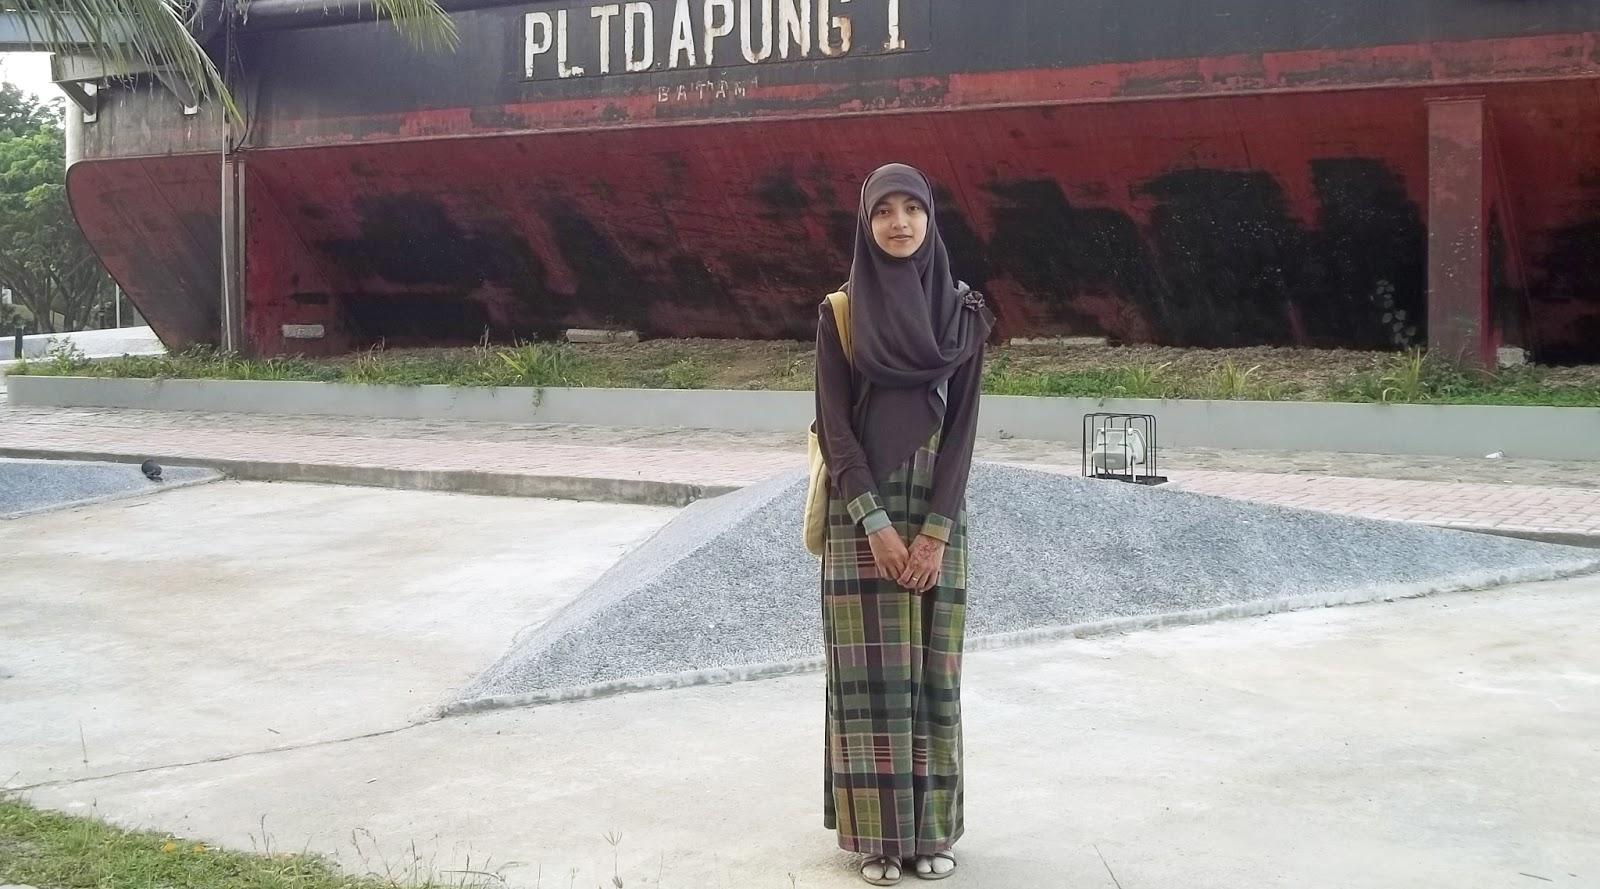 kapal diatas rumah tsunami aceh  misteri kapal pltd apung